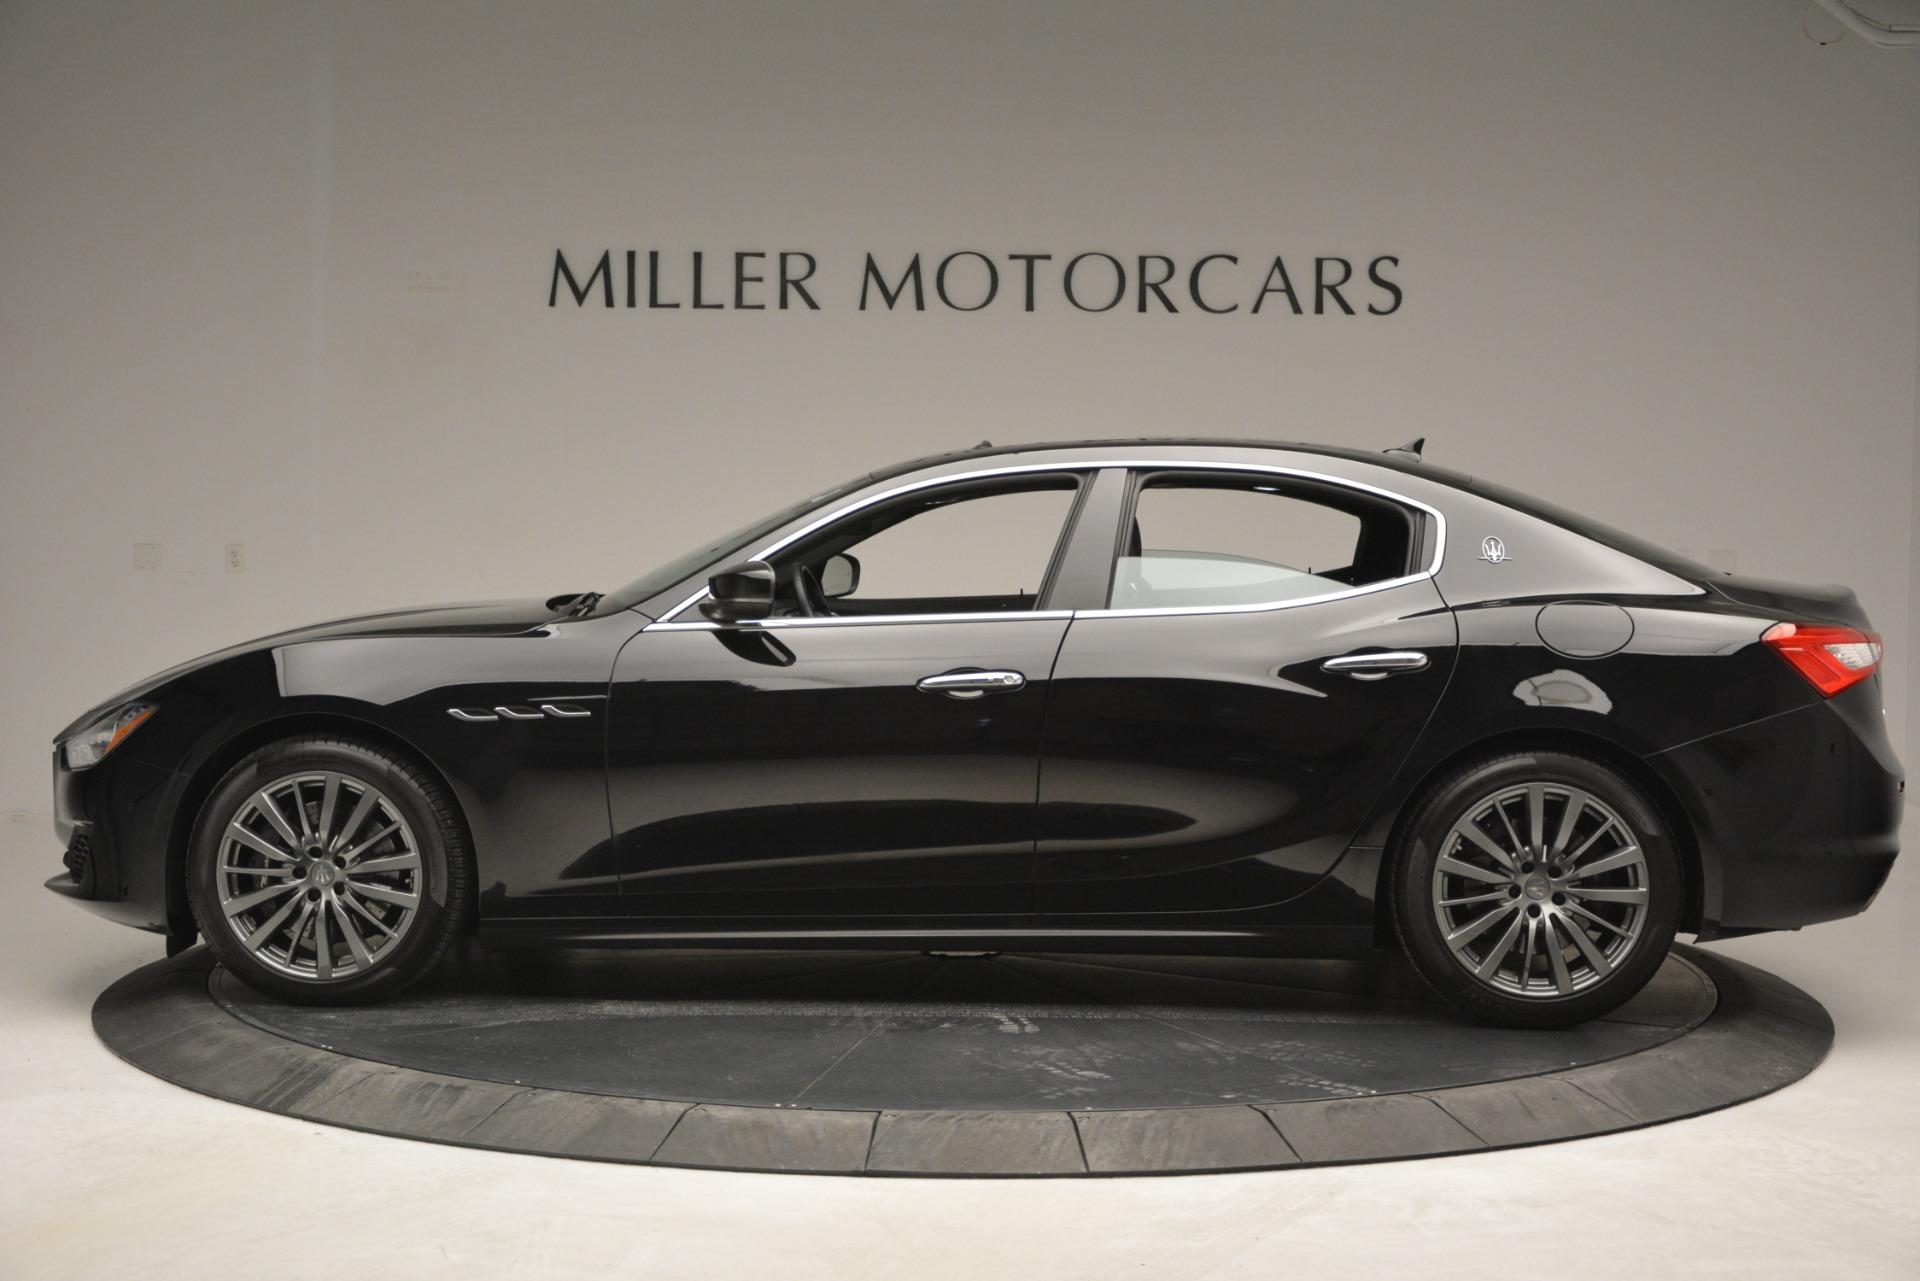 Used 2018 Maserati Ghibli S Q4 For Sale In Greenwich, CT 2944_p4